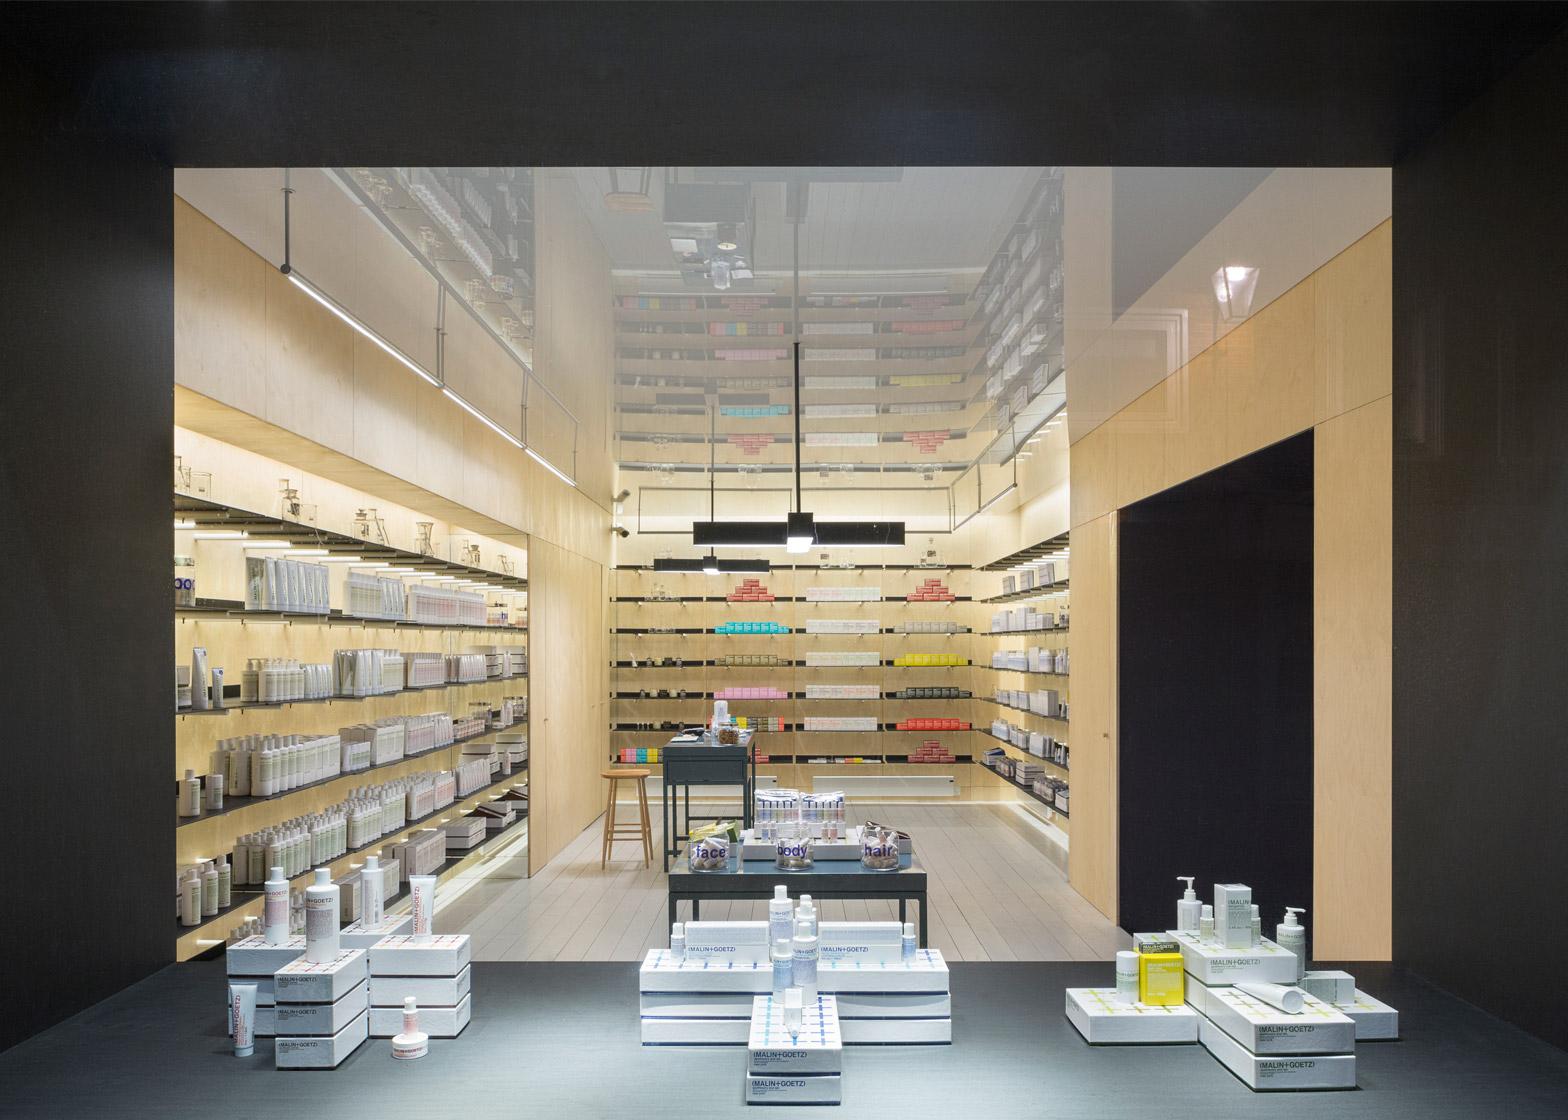 malingoetz-apothecary-shops-jonathan-tuckey-interior-london_dezeen_1568_0